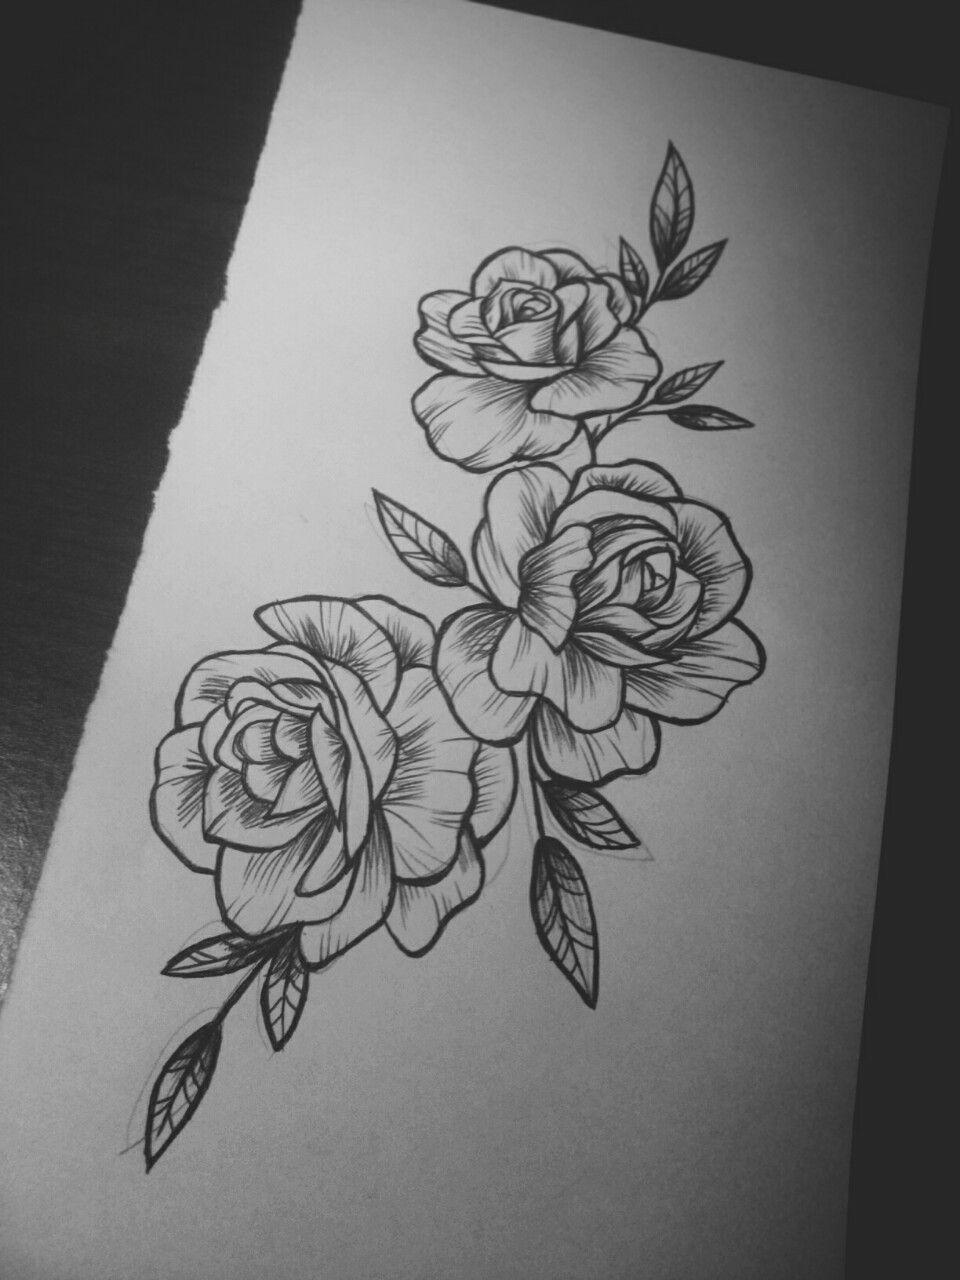 tattoo inspiration tattoo ideen pinterest tattoo ideen tattoo vorlagen und t towierungen. Black Bedroom Furniture Sets. Home Design Ideas